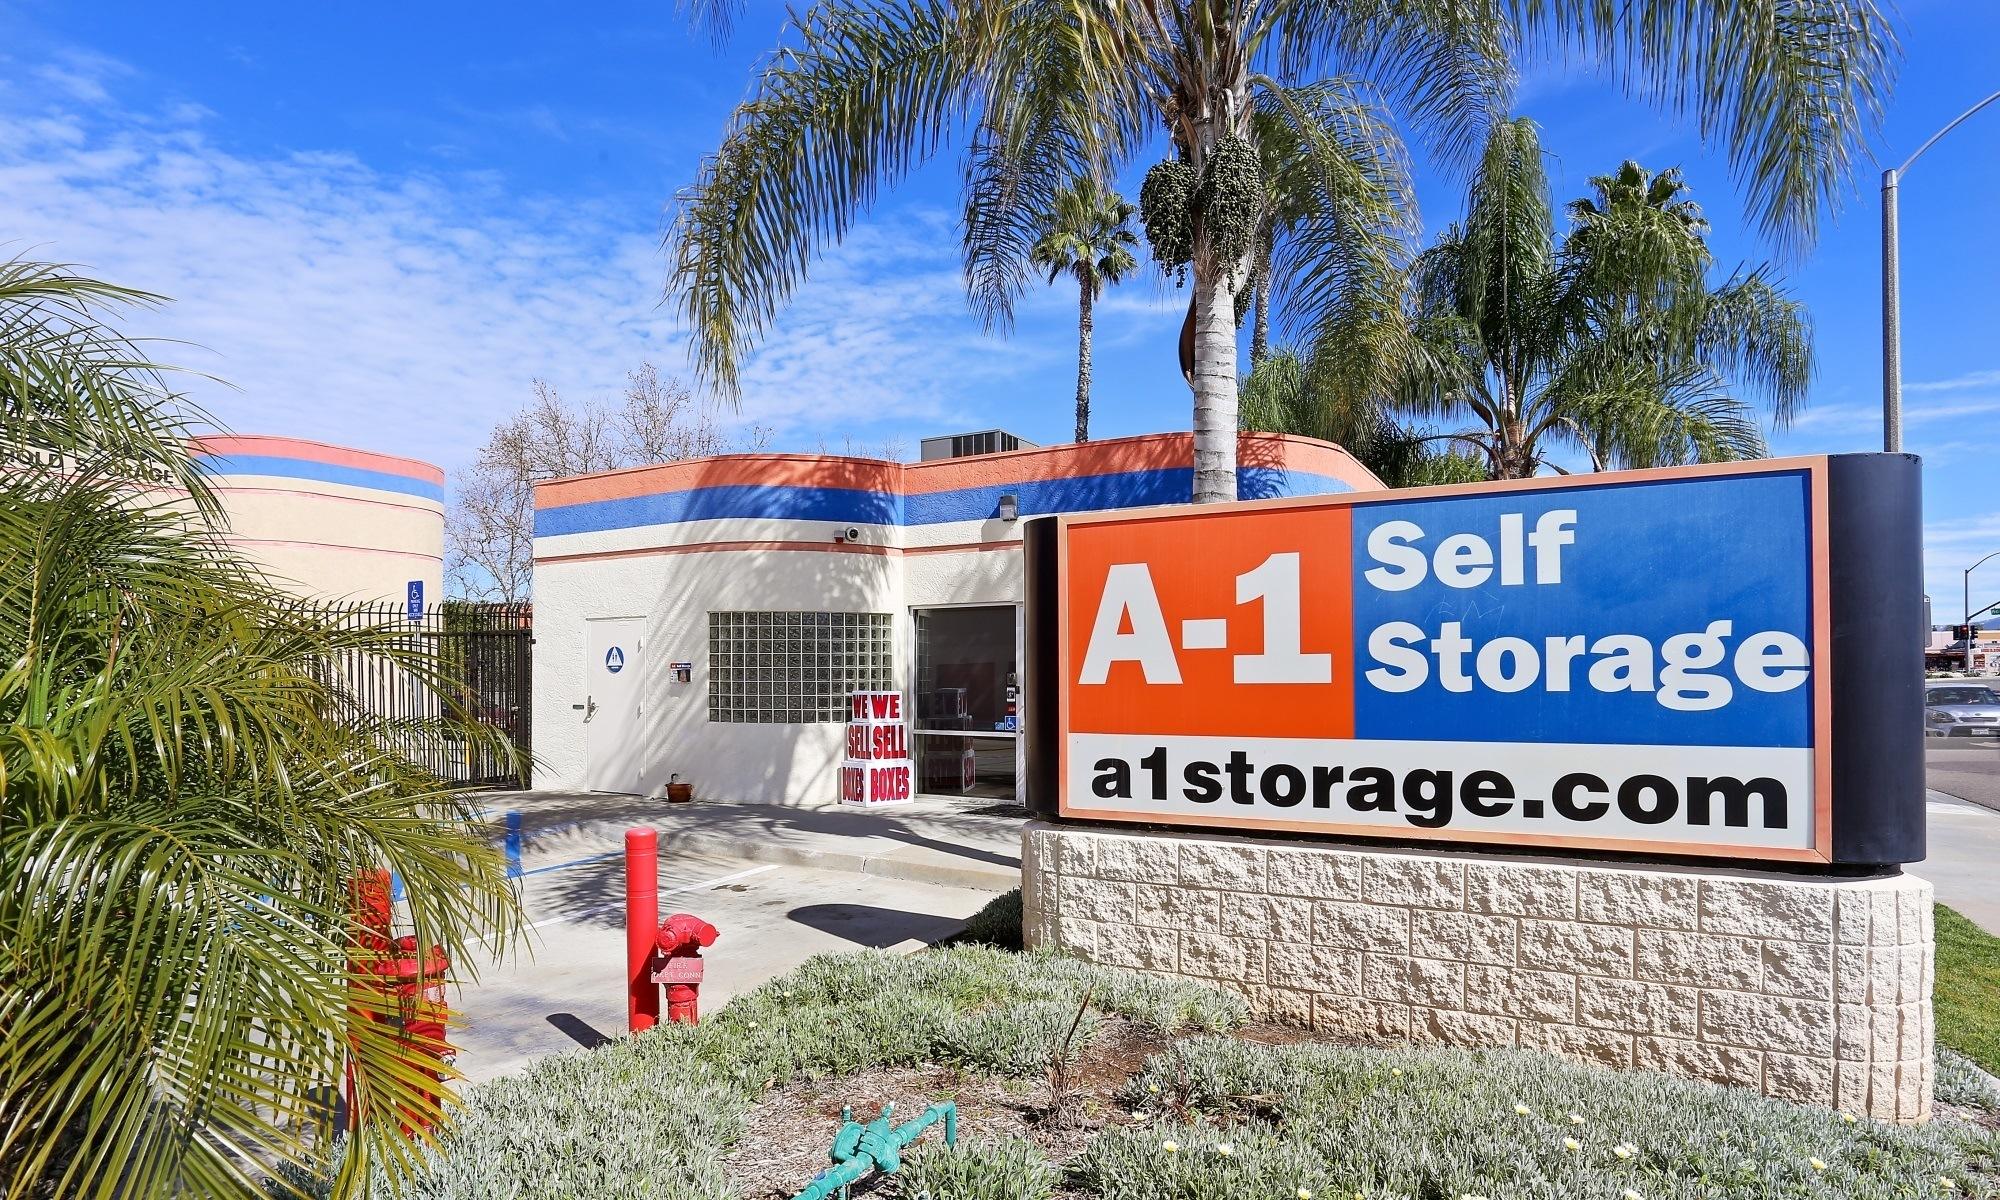 Self storage in El Cajon CA